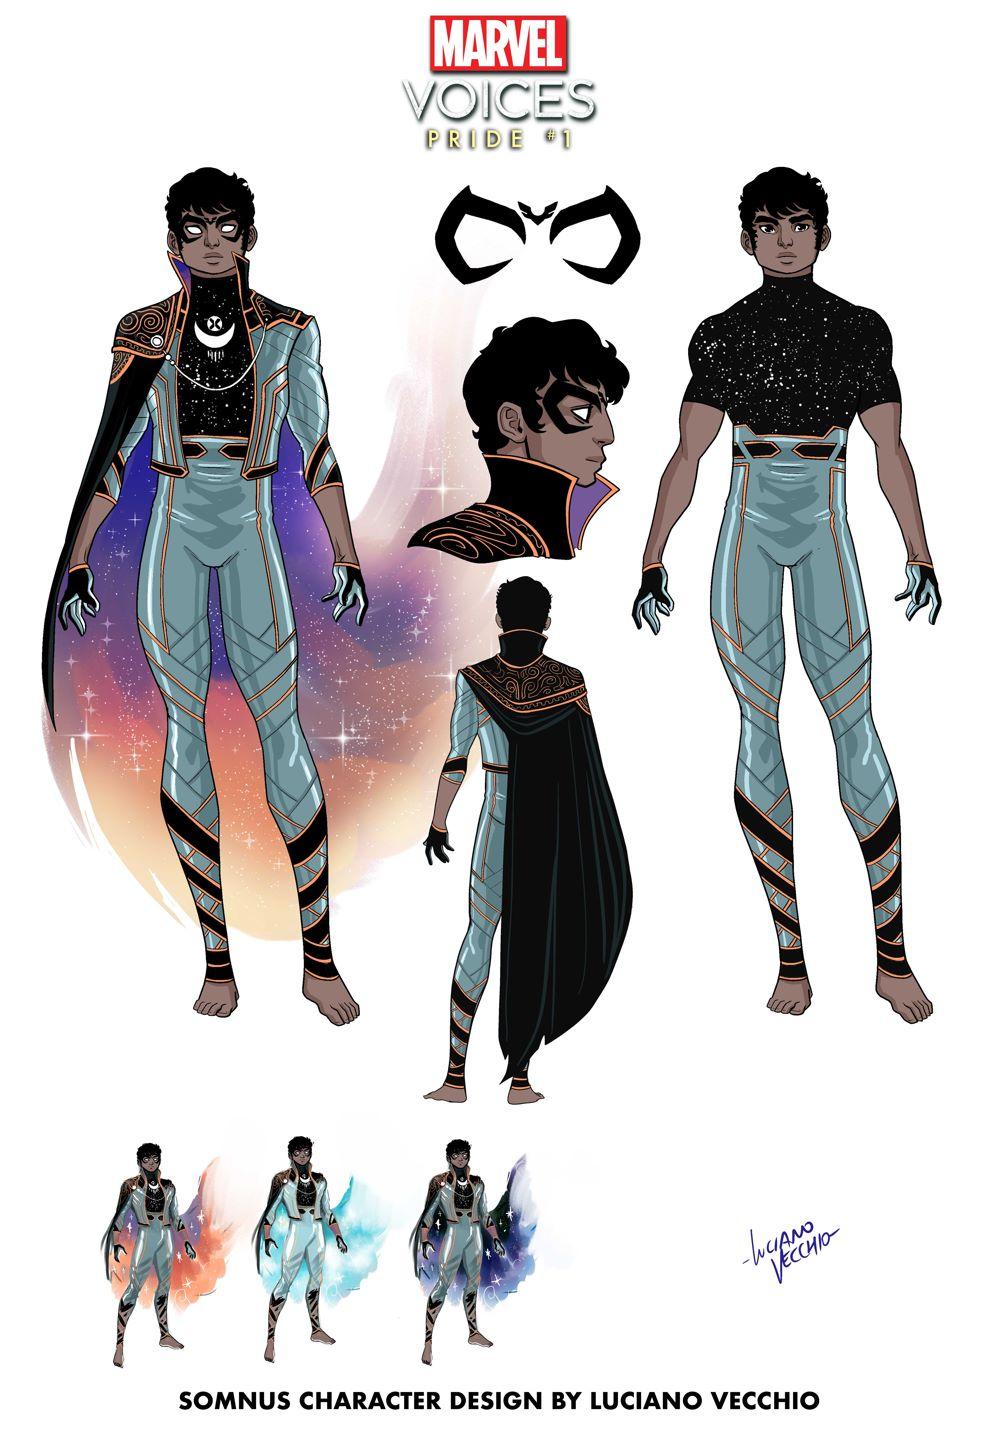 MARVOICESPRIDE2021001_Somnus-character-design Somnus wakes the world in MARVEL'S VOICES: PRIDE #1